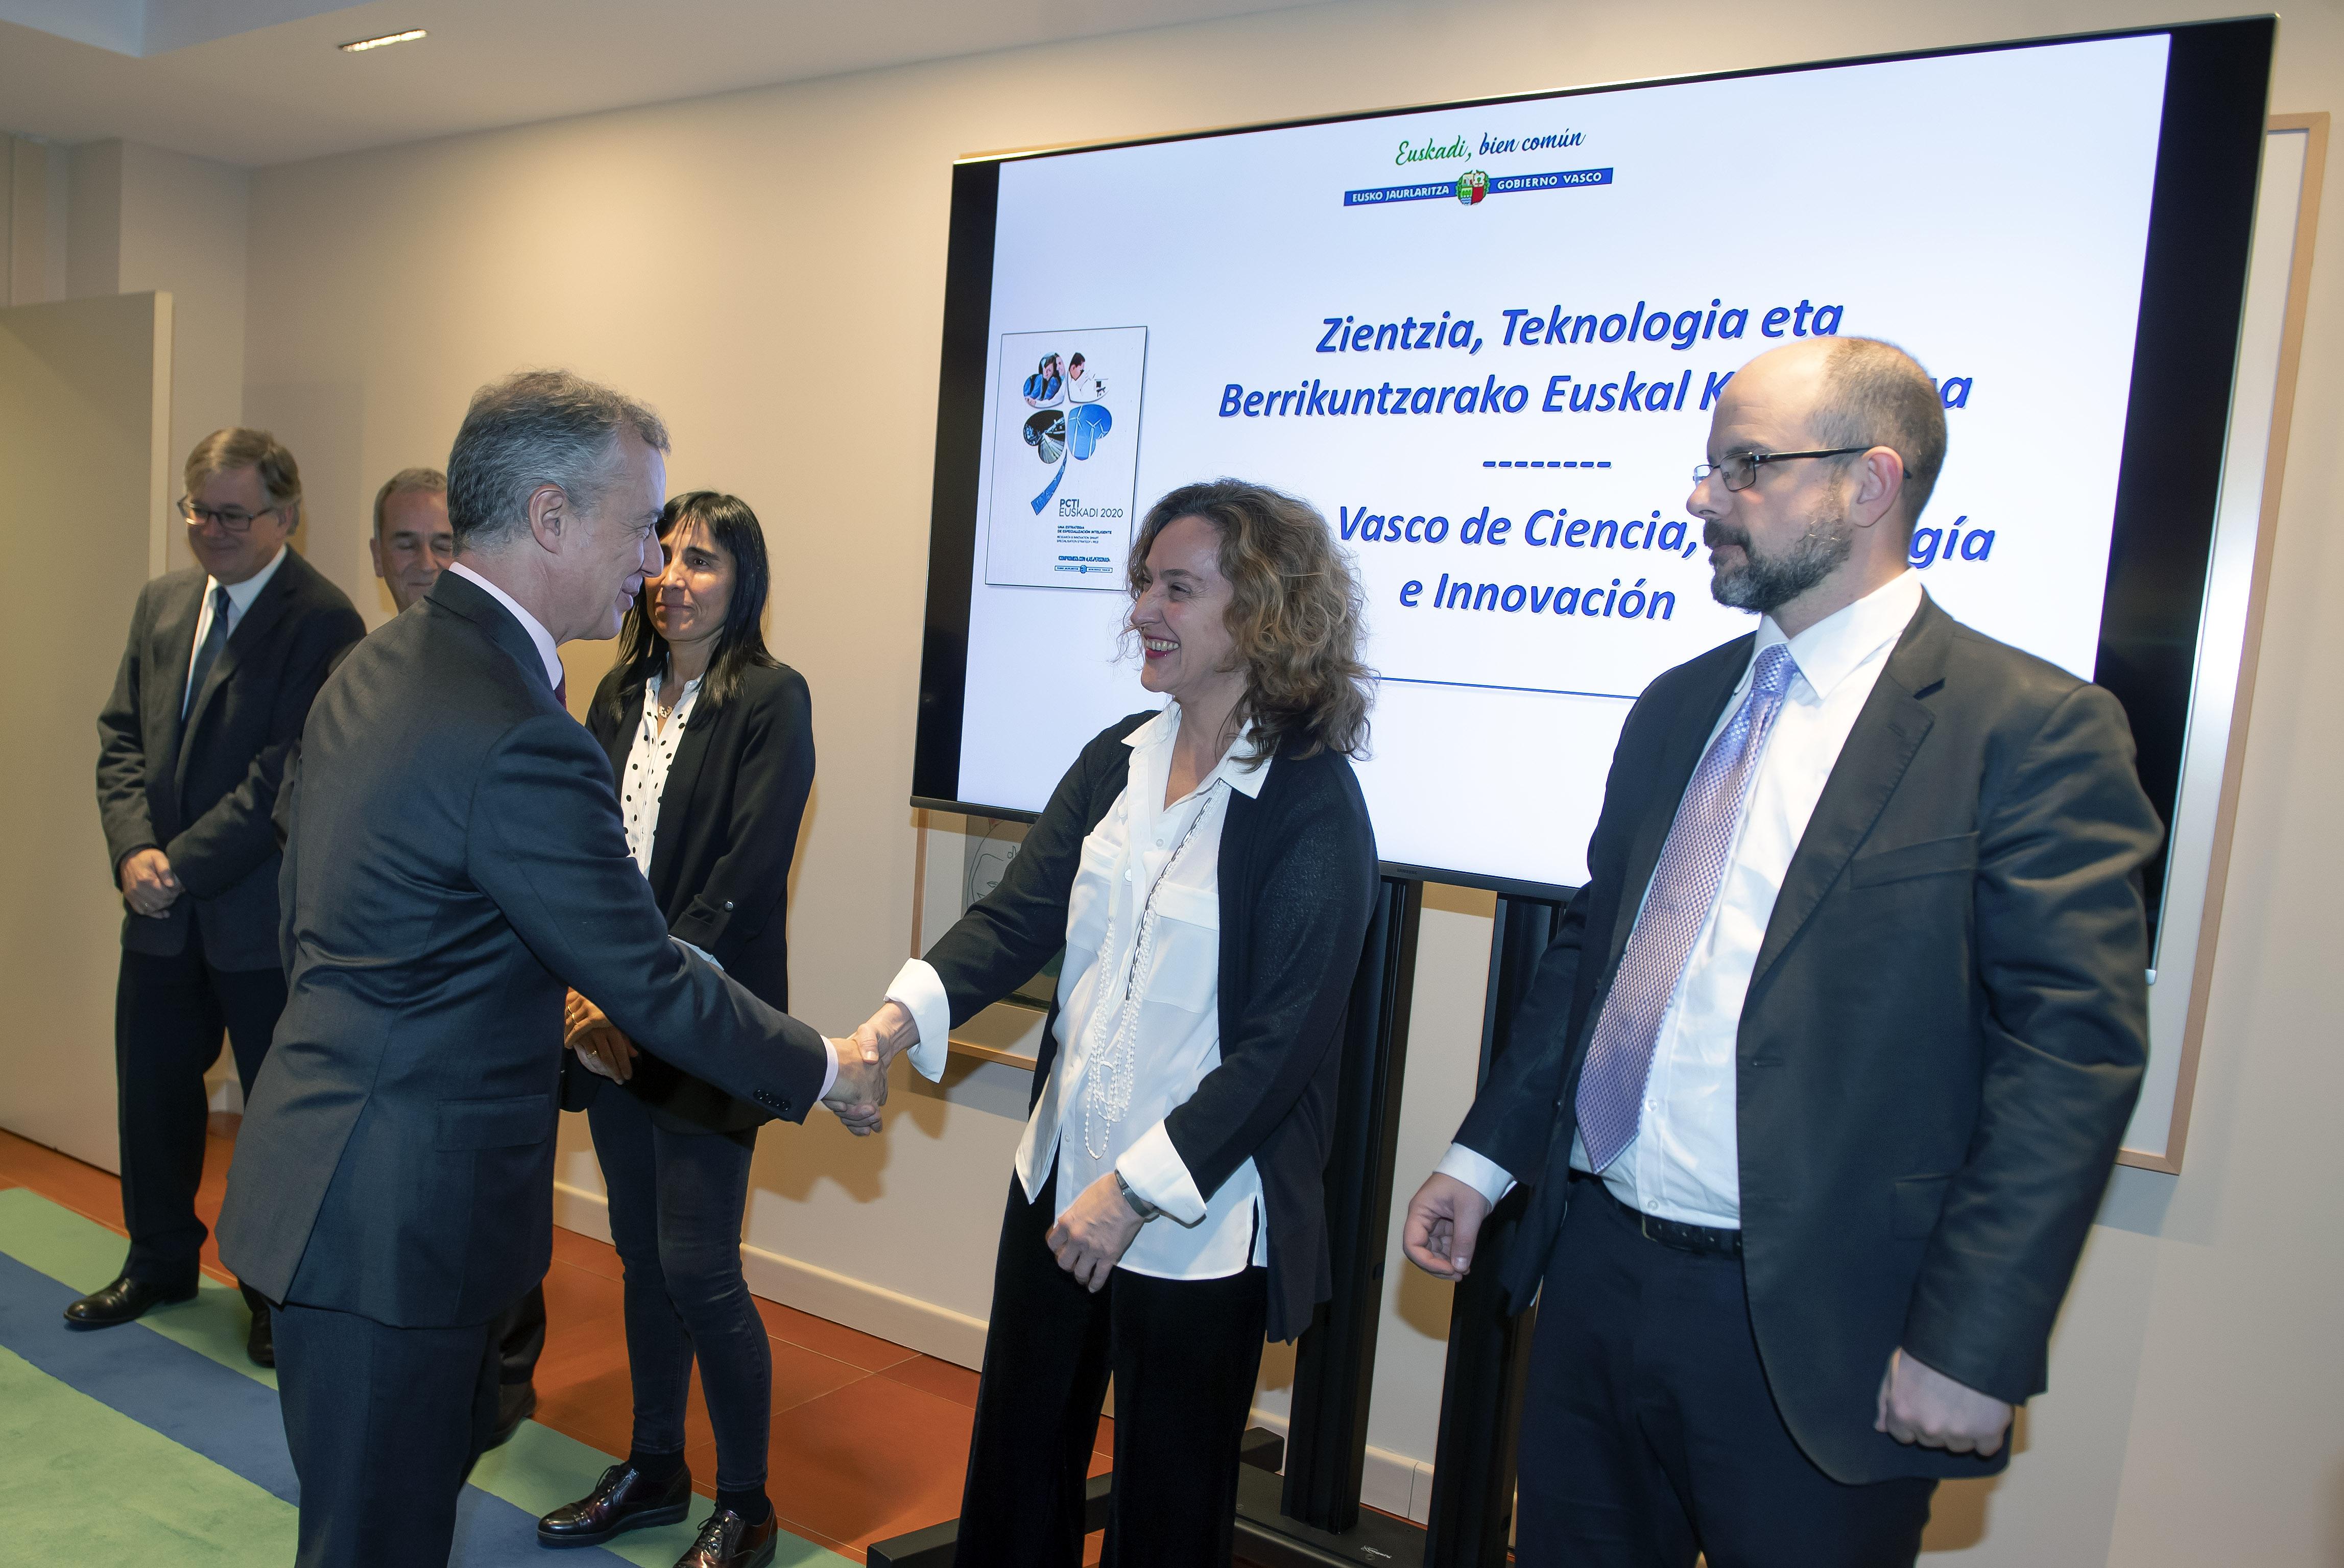 2018_12_11_lhk_consejo_vasco_ciencia.jpg